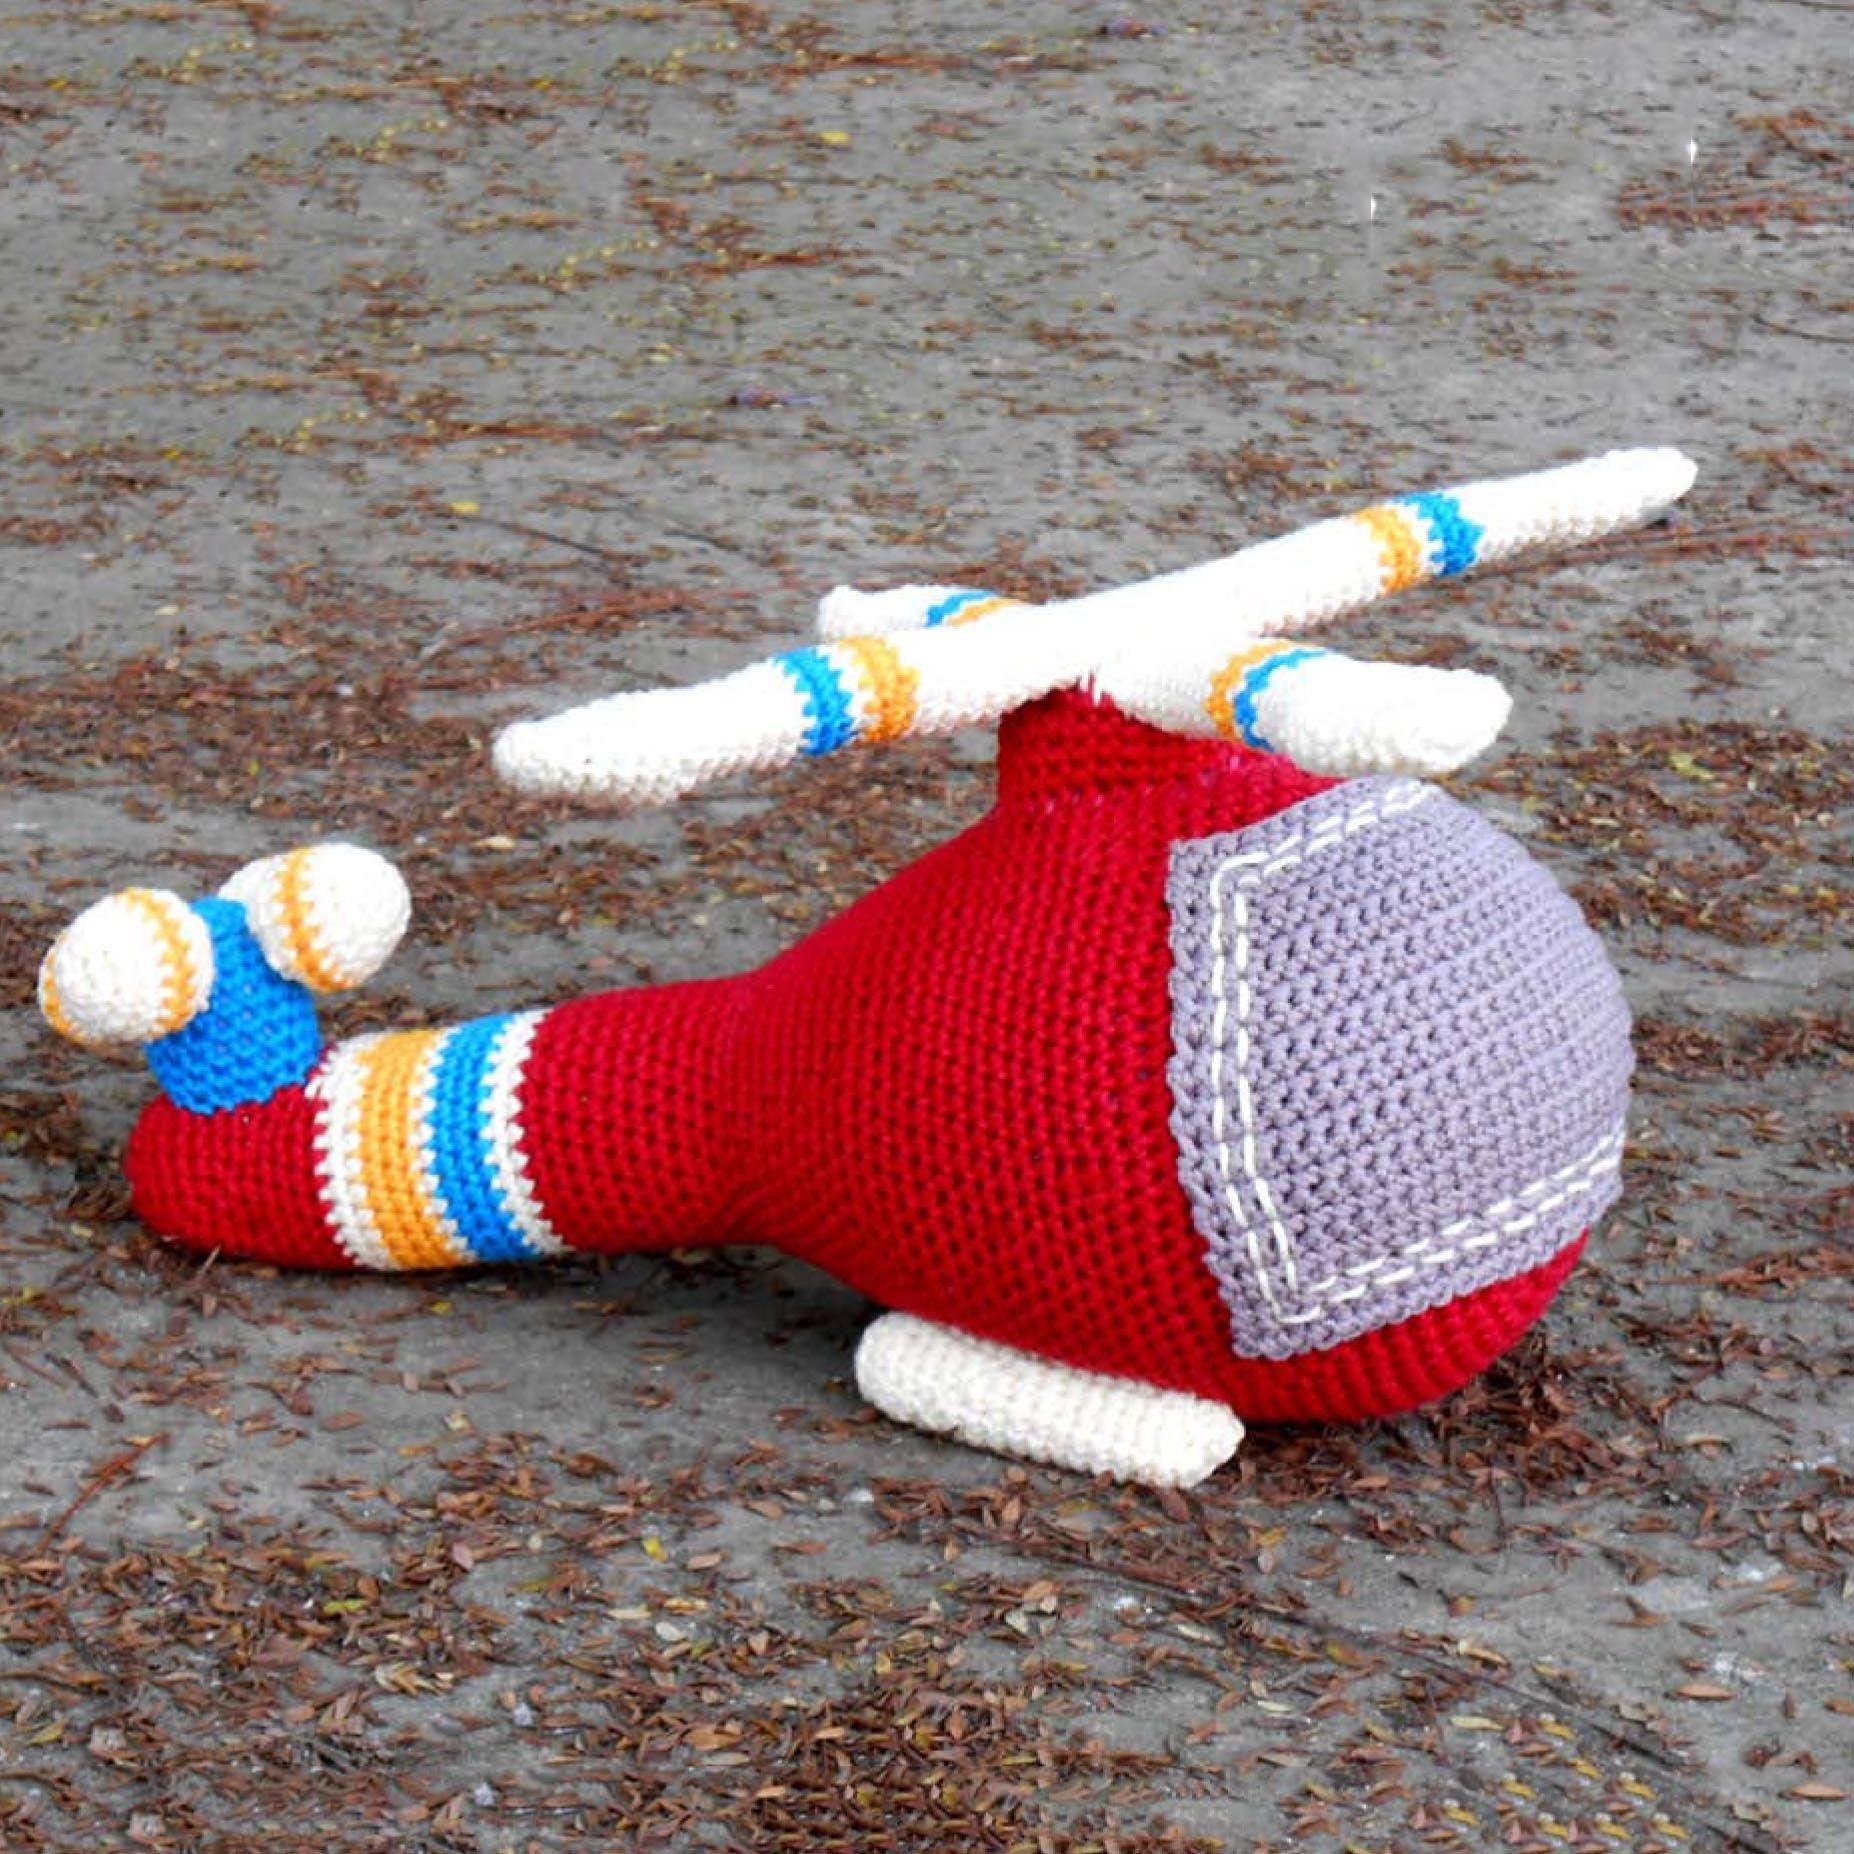 Helicopter amigurumi pattern - Free Pattern | Crochet | Pinterest ...